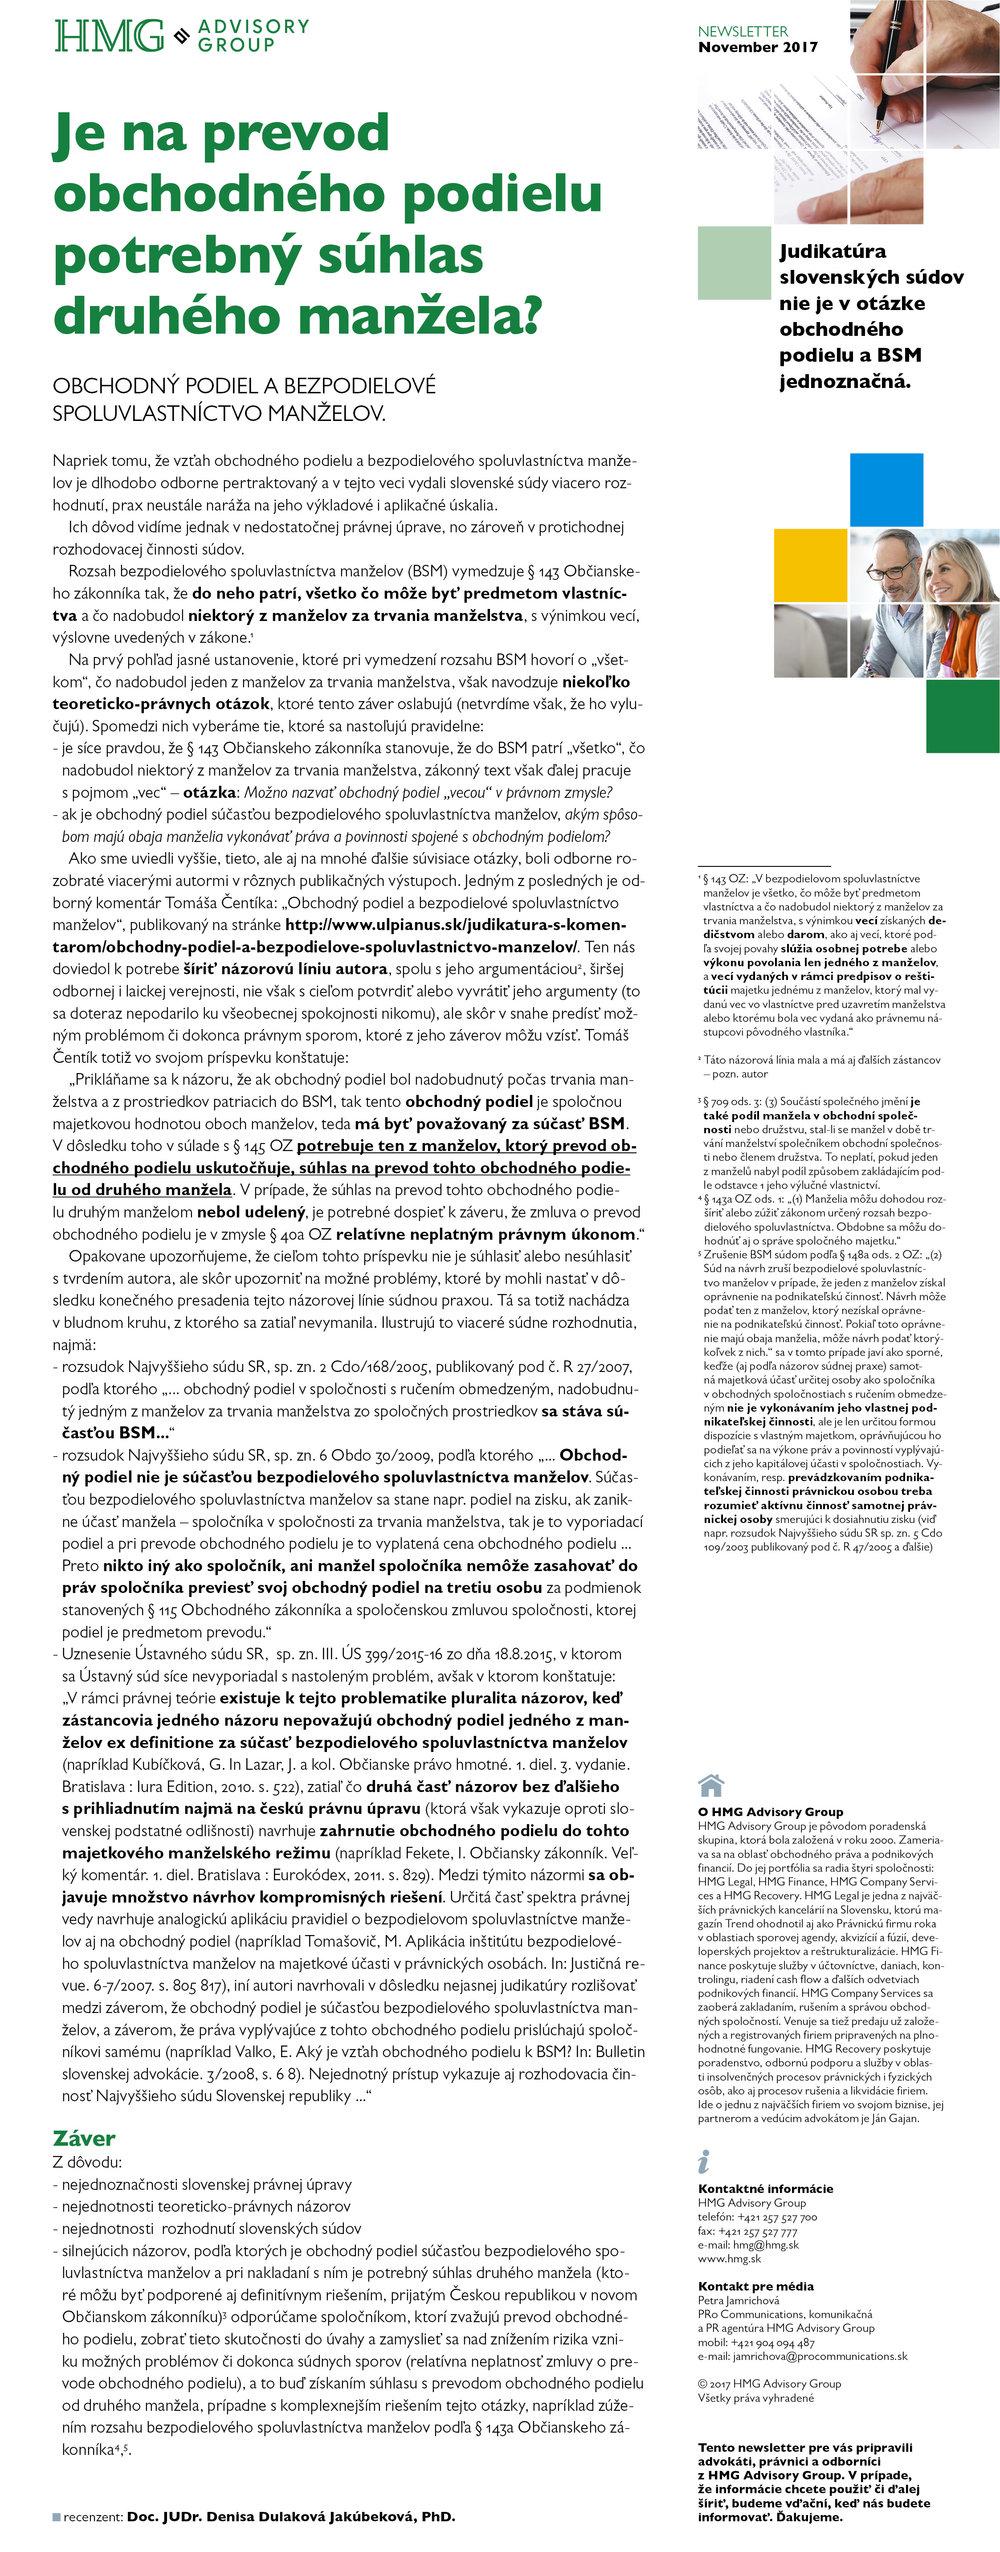 HMG_newsletter_podiel.jpg